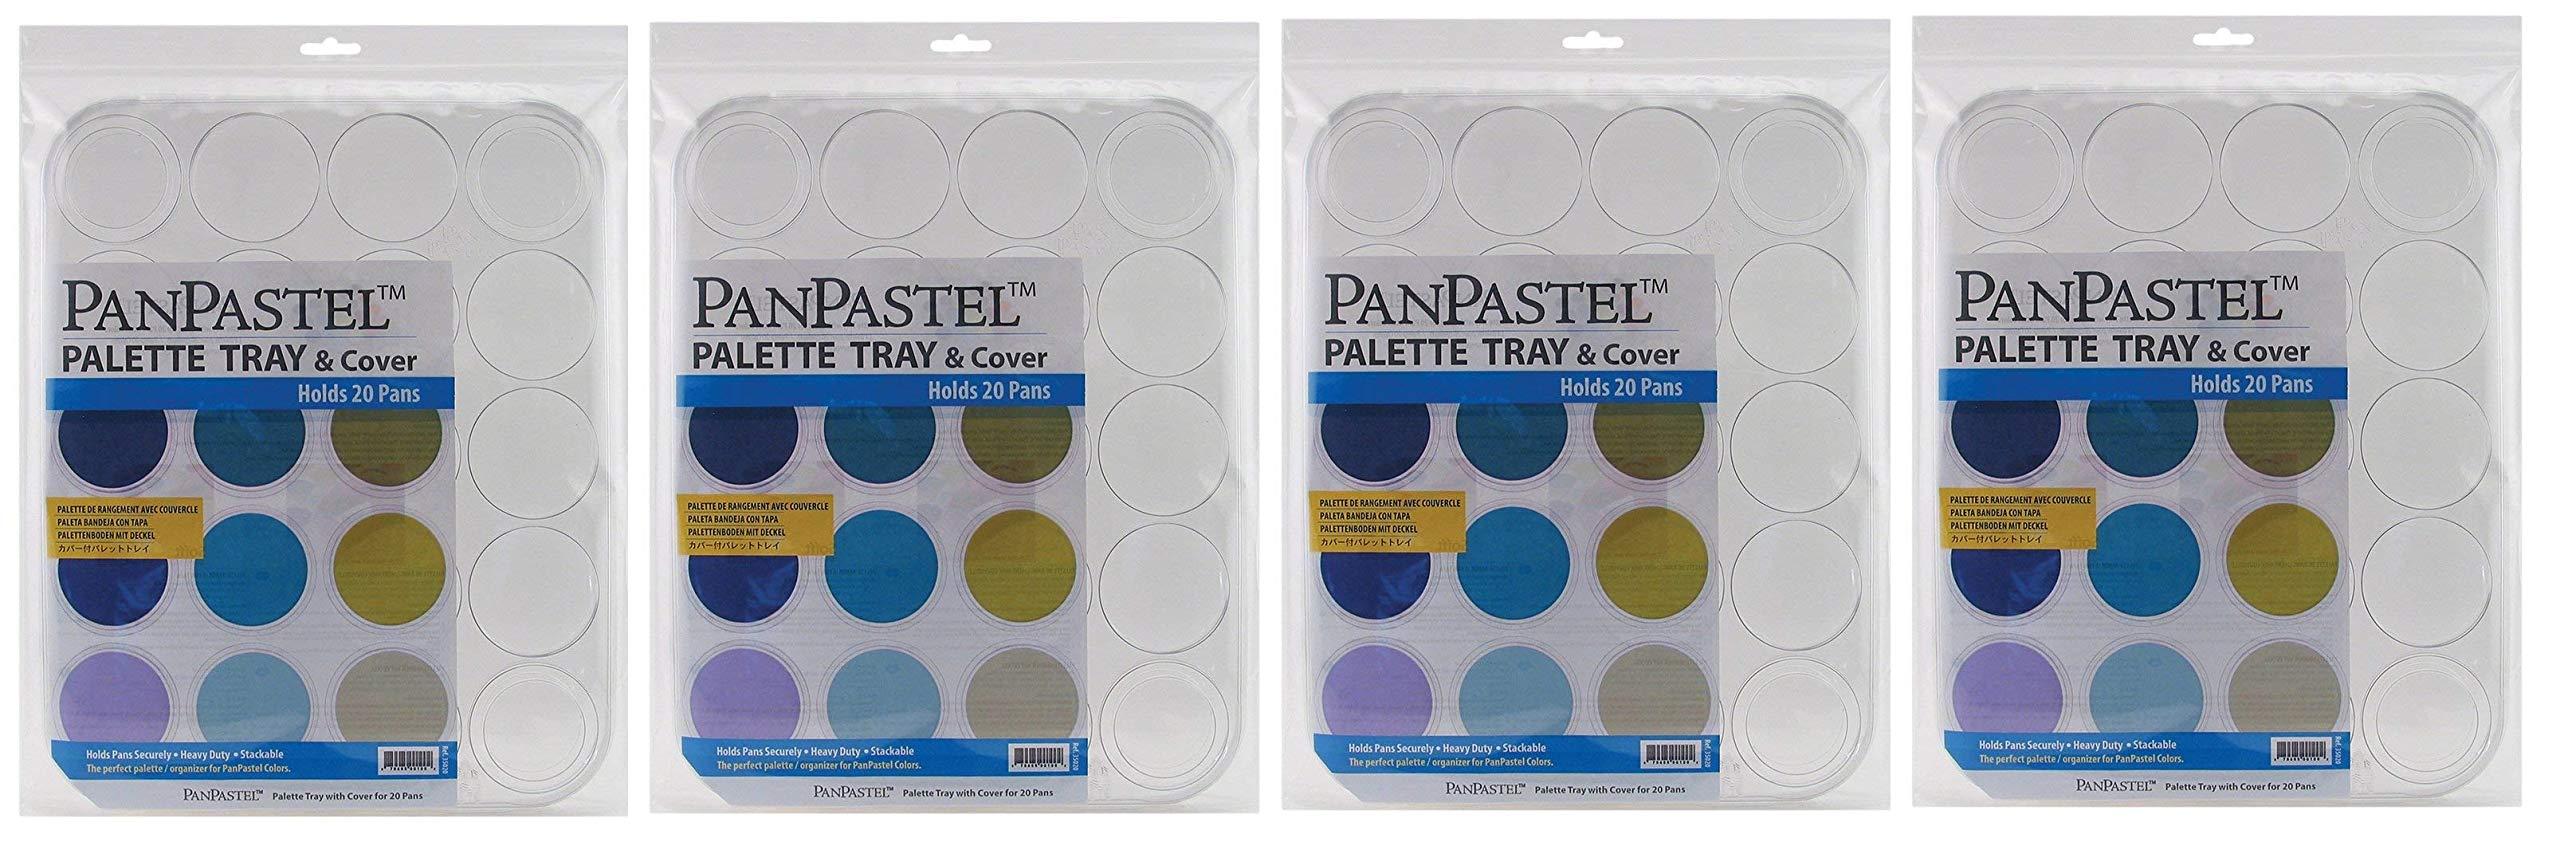 Panpastel 20 Cavity Palette Tray (Fоur Paсk)